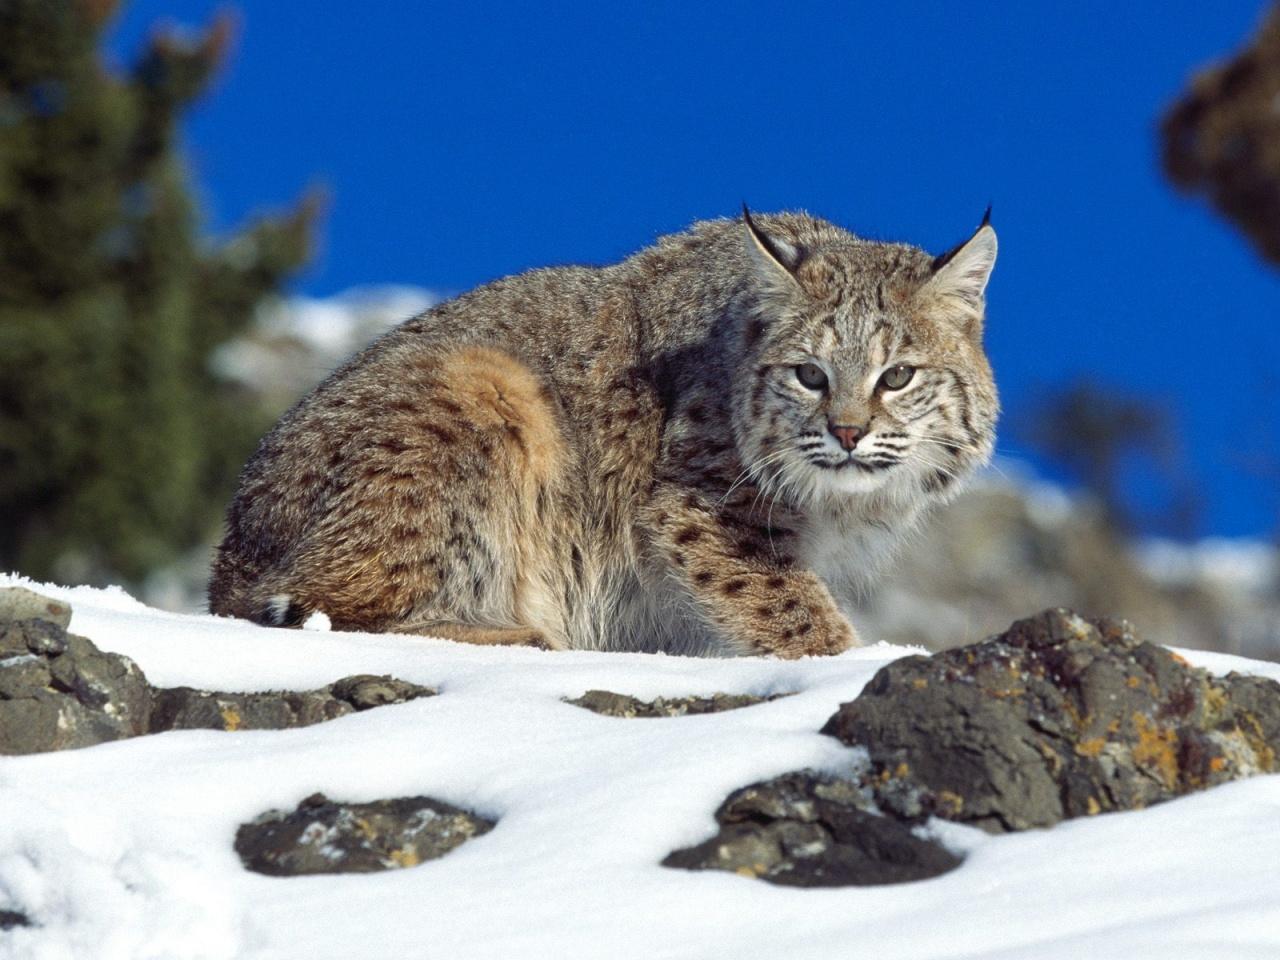 Bobcat [Desktop wallpaper 1280x960] Animal Desktop Wps Pinterest 1280x960